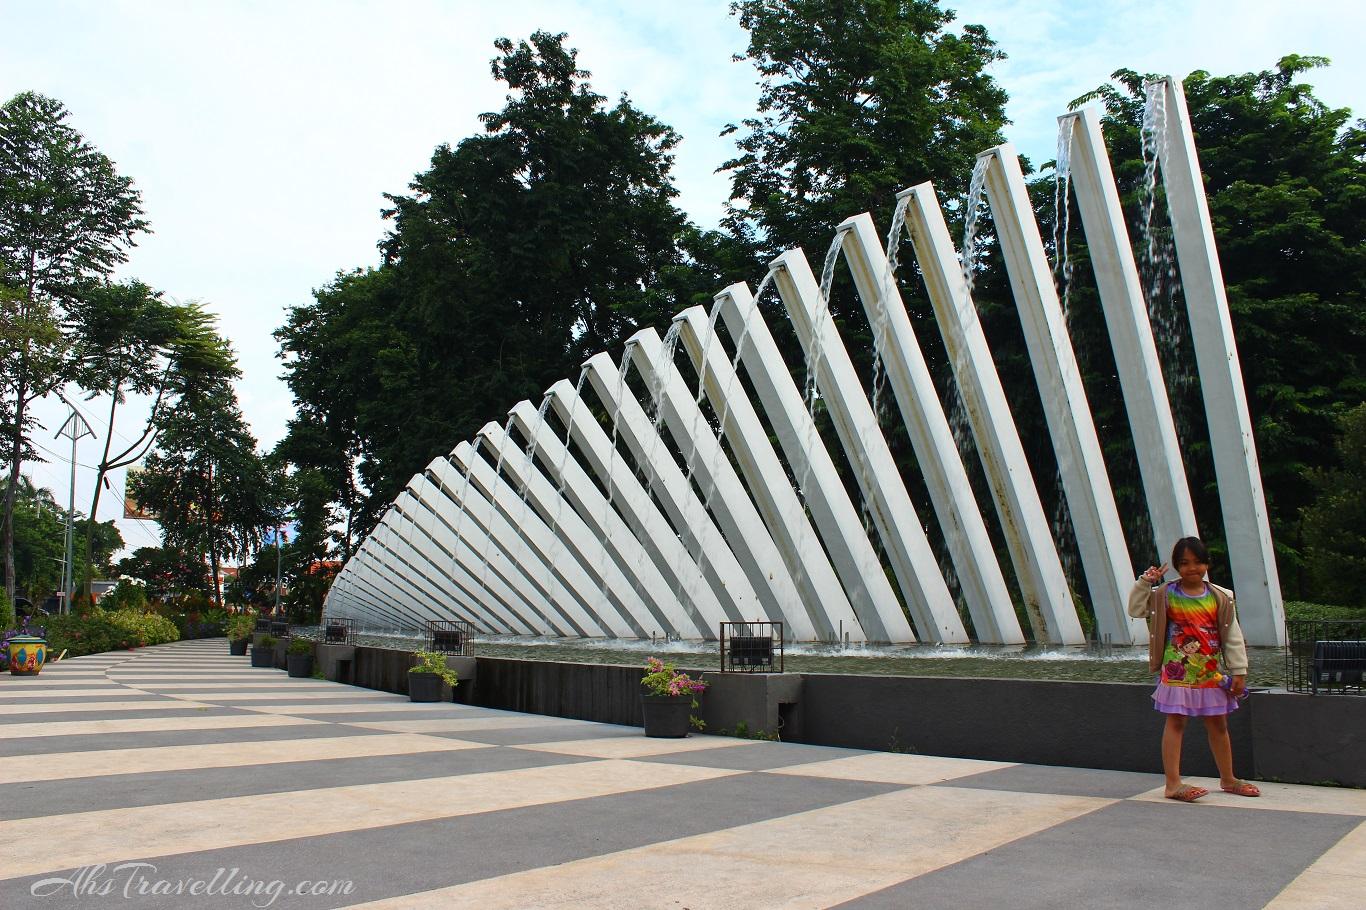 Taman Pelangi Surabaya Ahs Travelling Kota Seribu